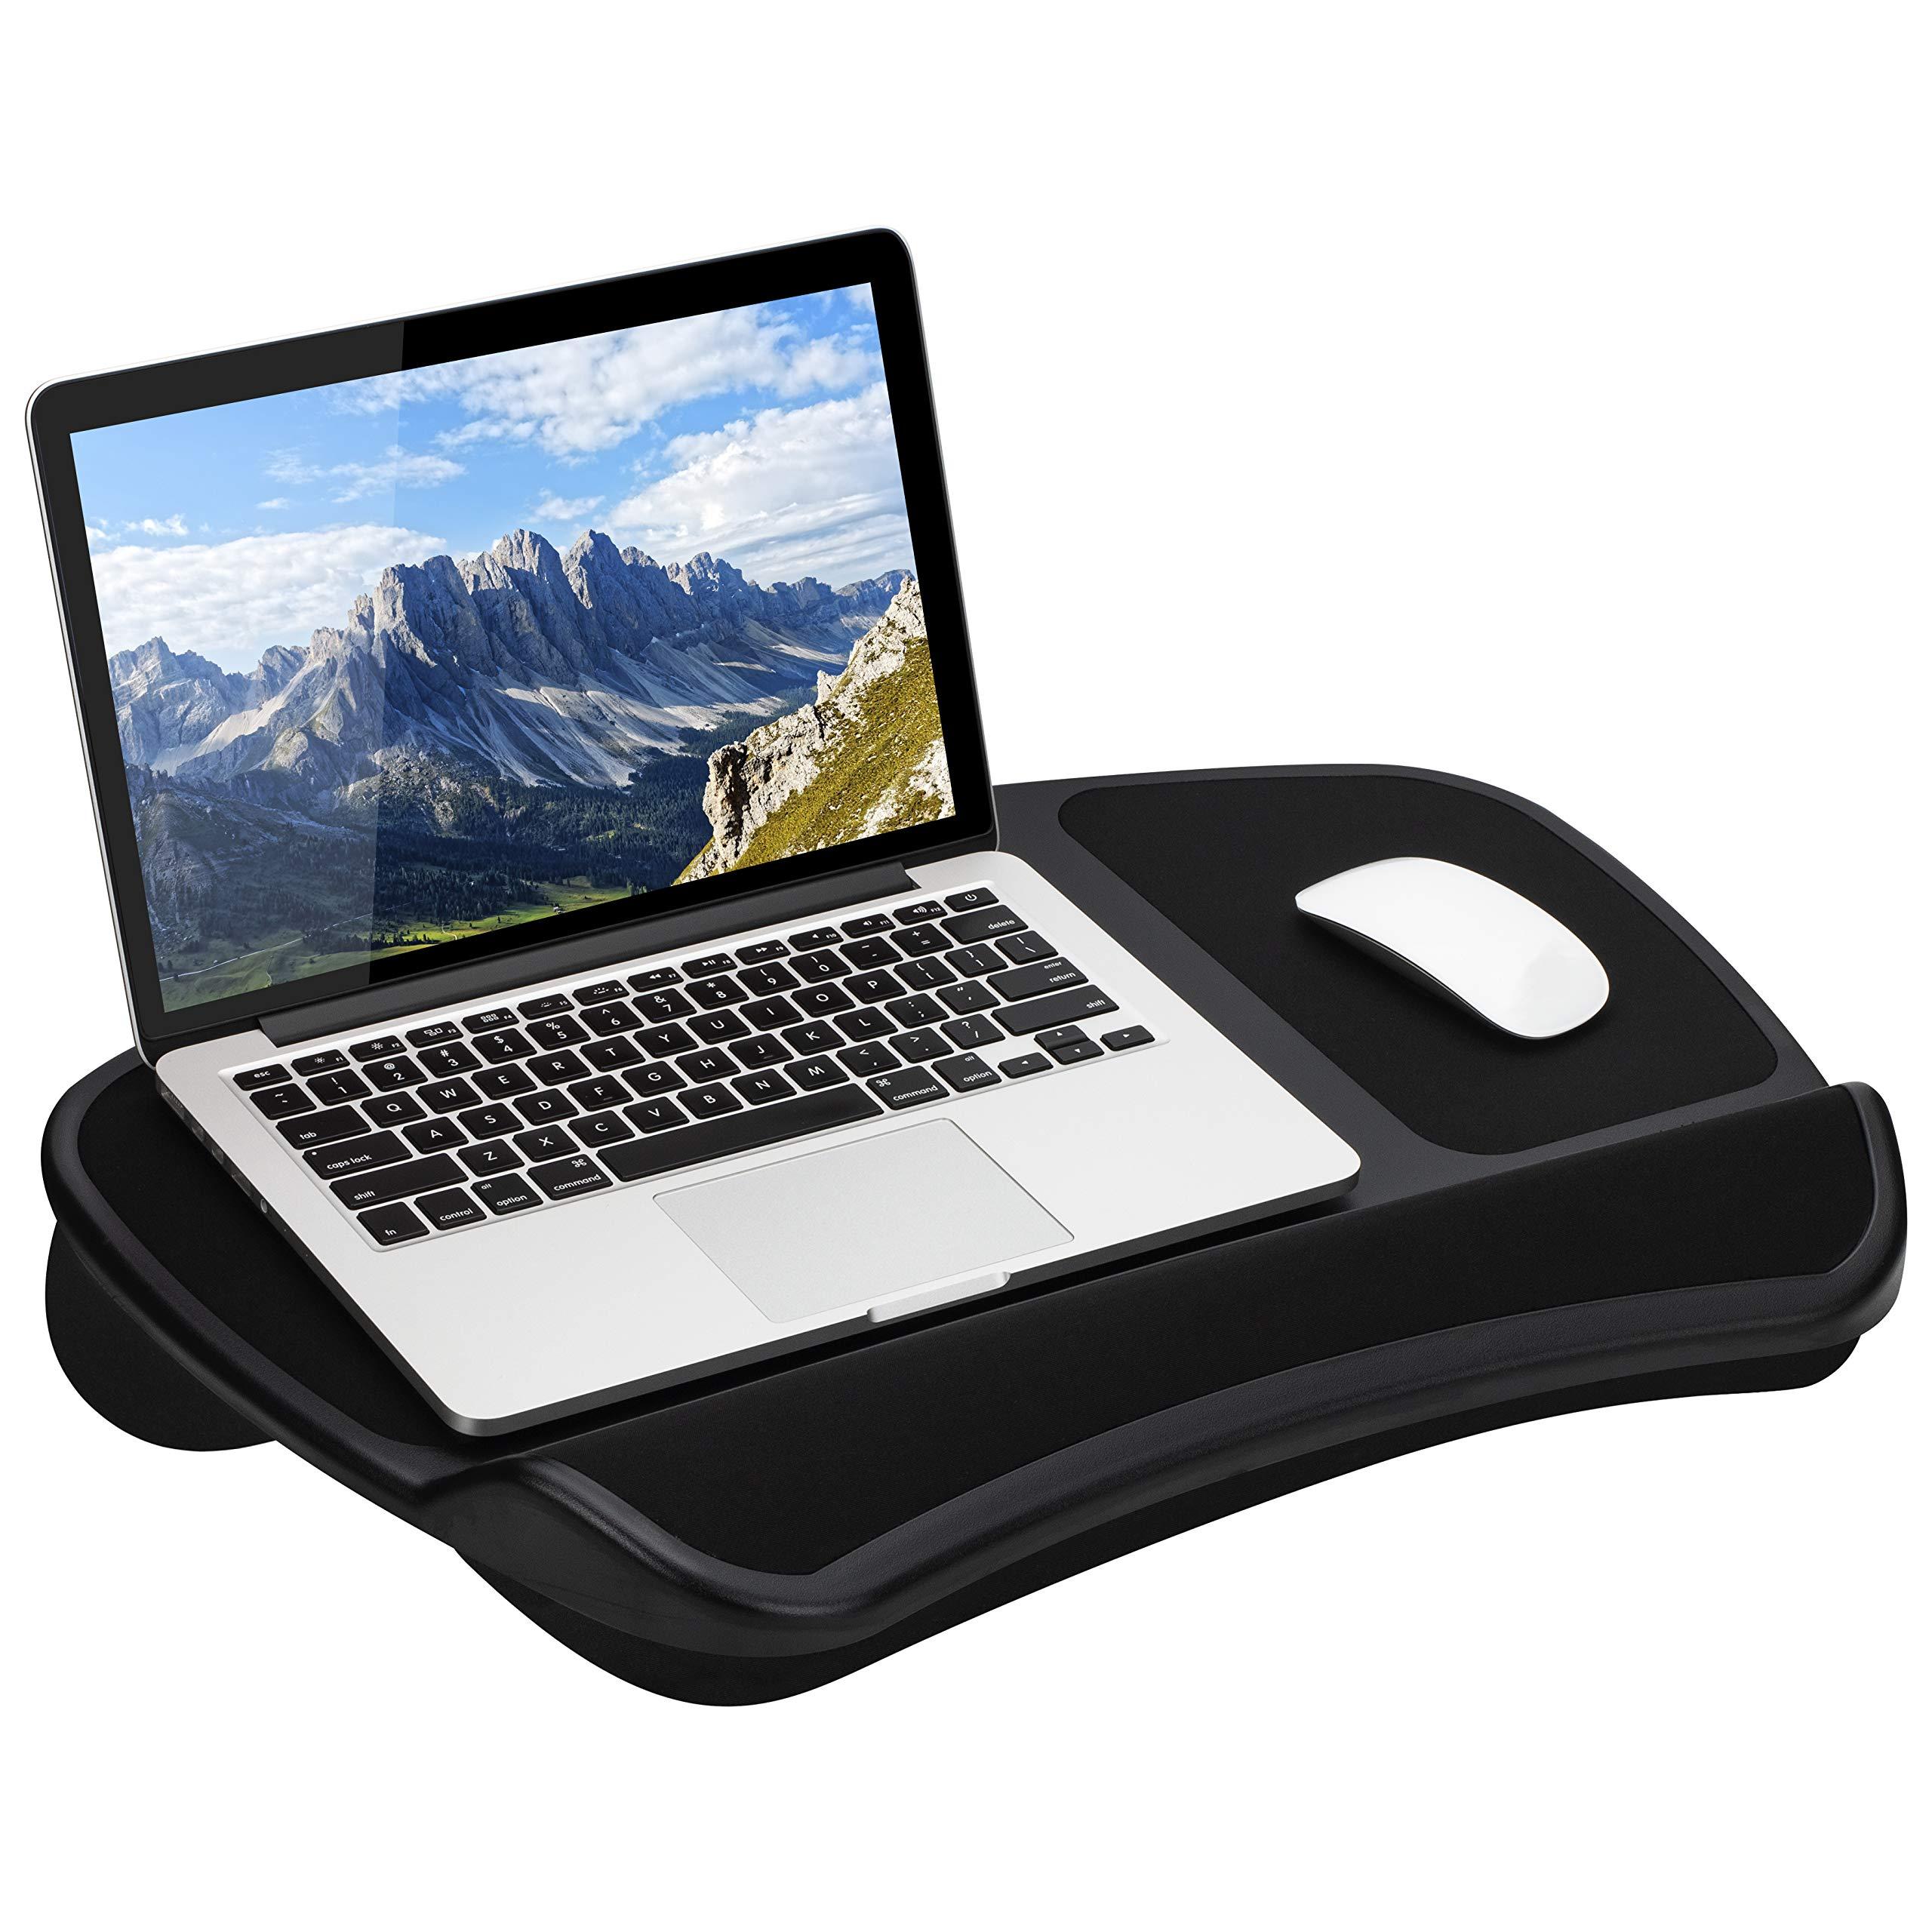 LapGear Original XL Laptop Lap Desk with Storage Pockets - Black - Style No. 45592 - US Patent No. D619,823 by LapGear